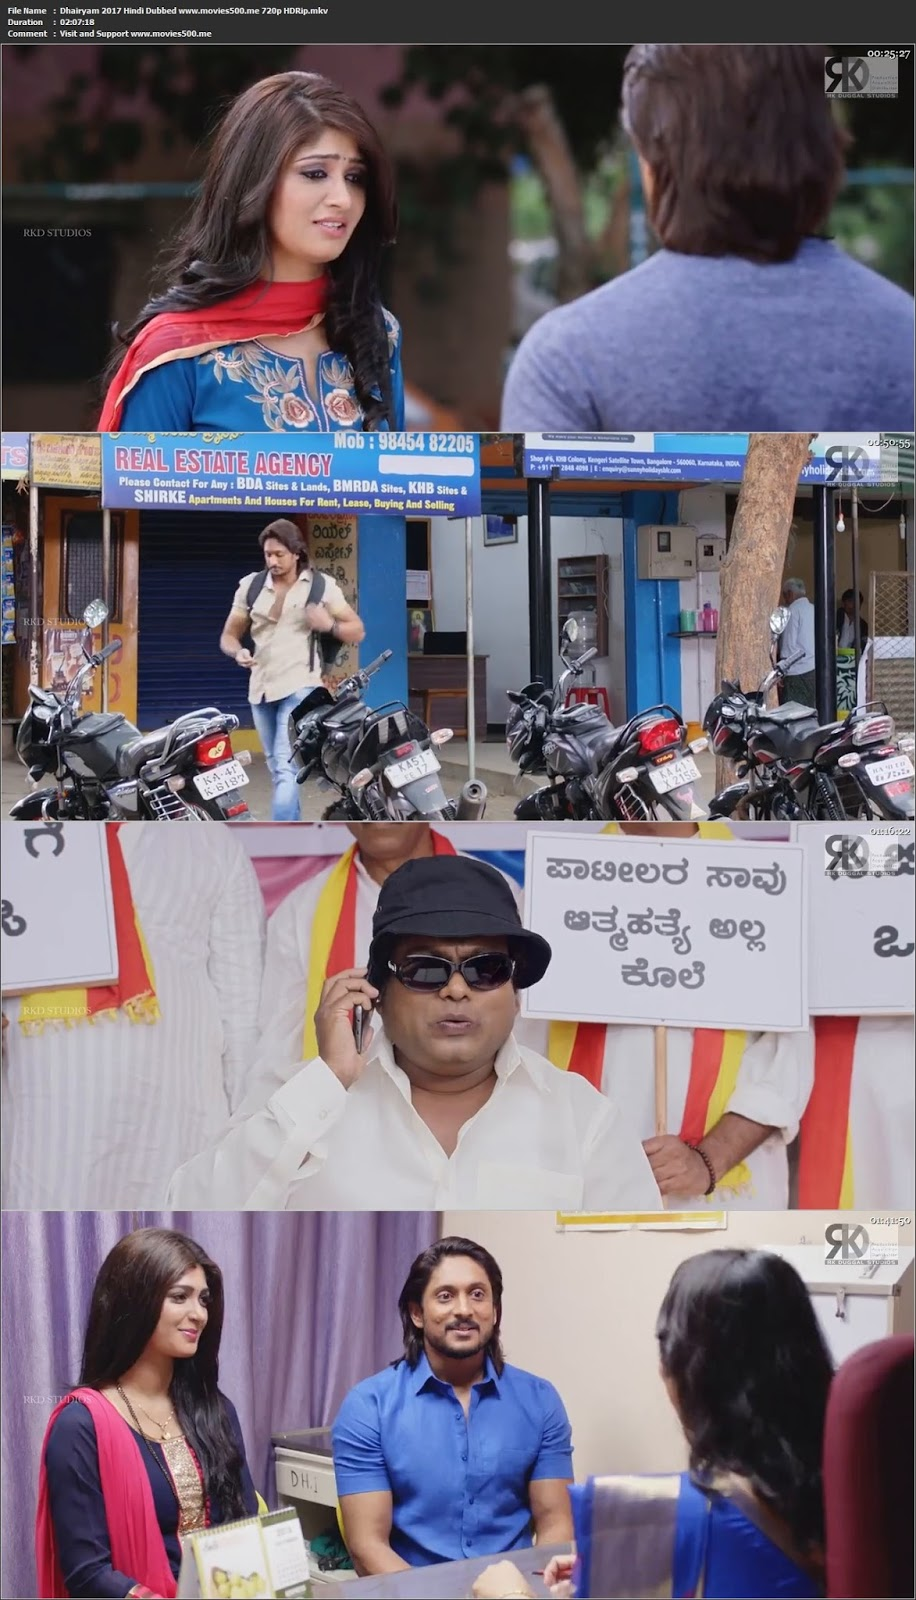 Dhairyam 2017 Hindi Dubbed Full Movie HDRip 720p at newbtcbank.com